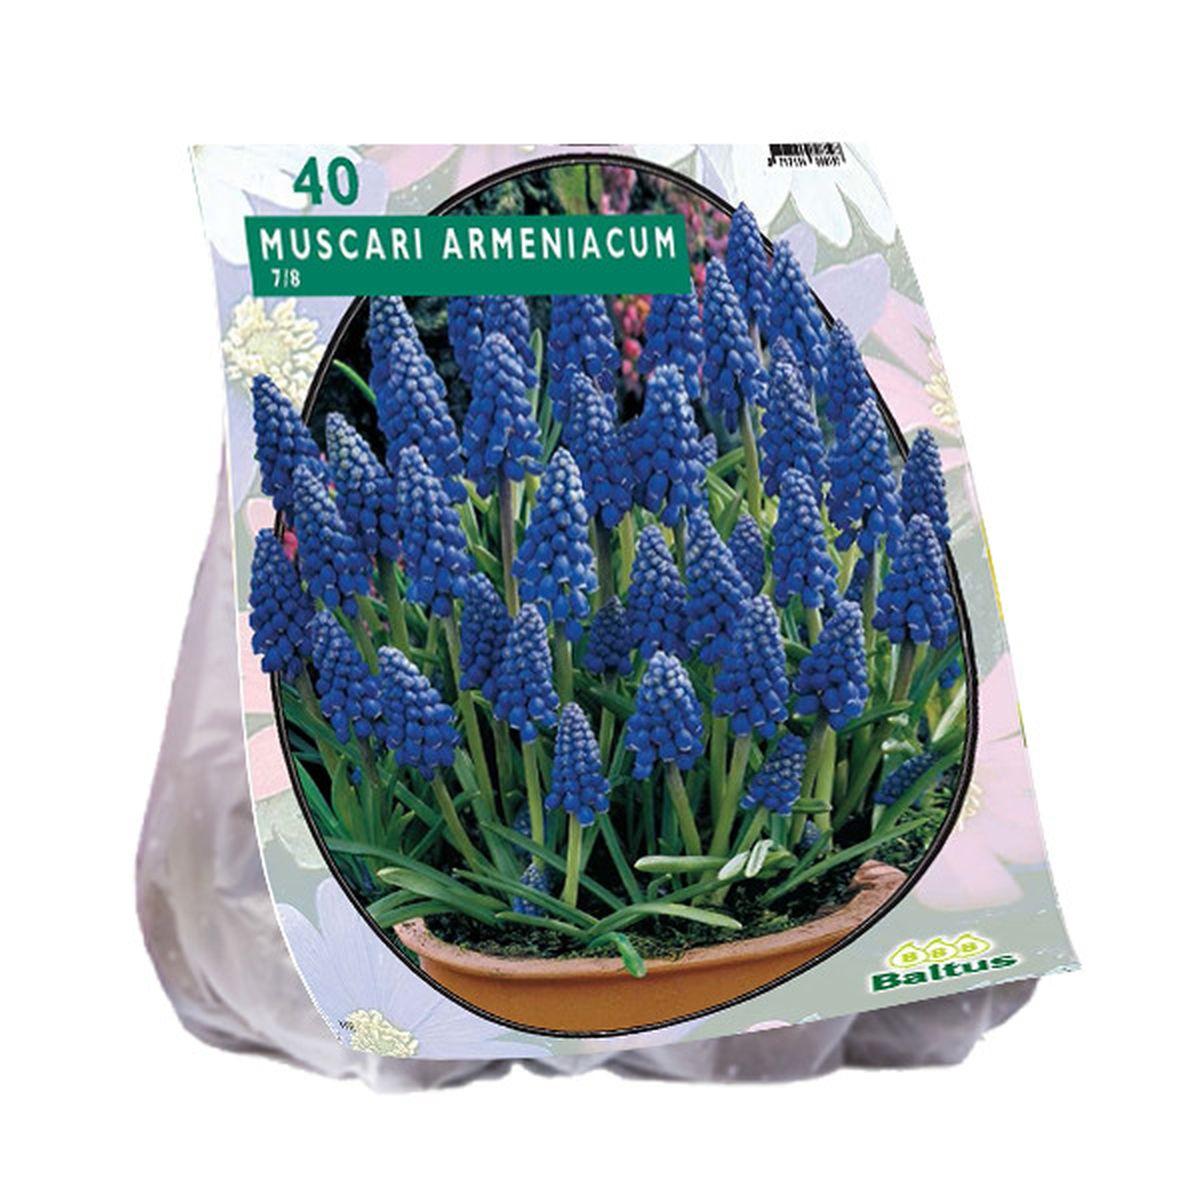 Blauwe druif - muscari armeniacum